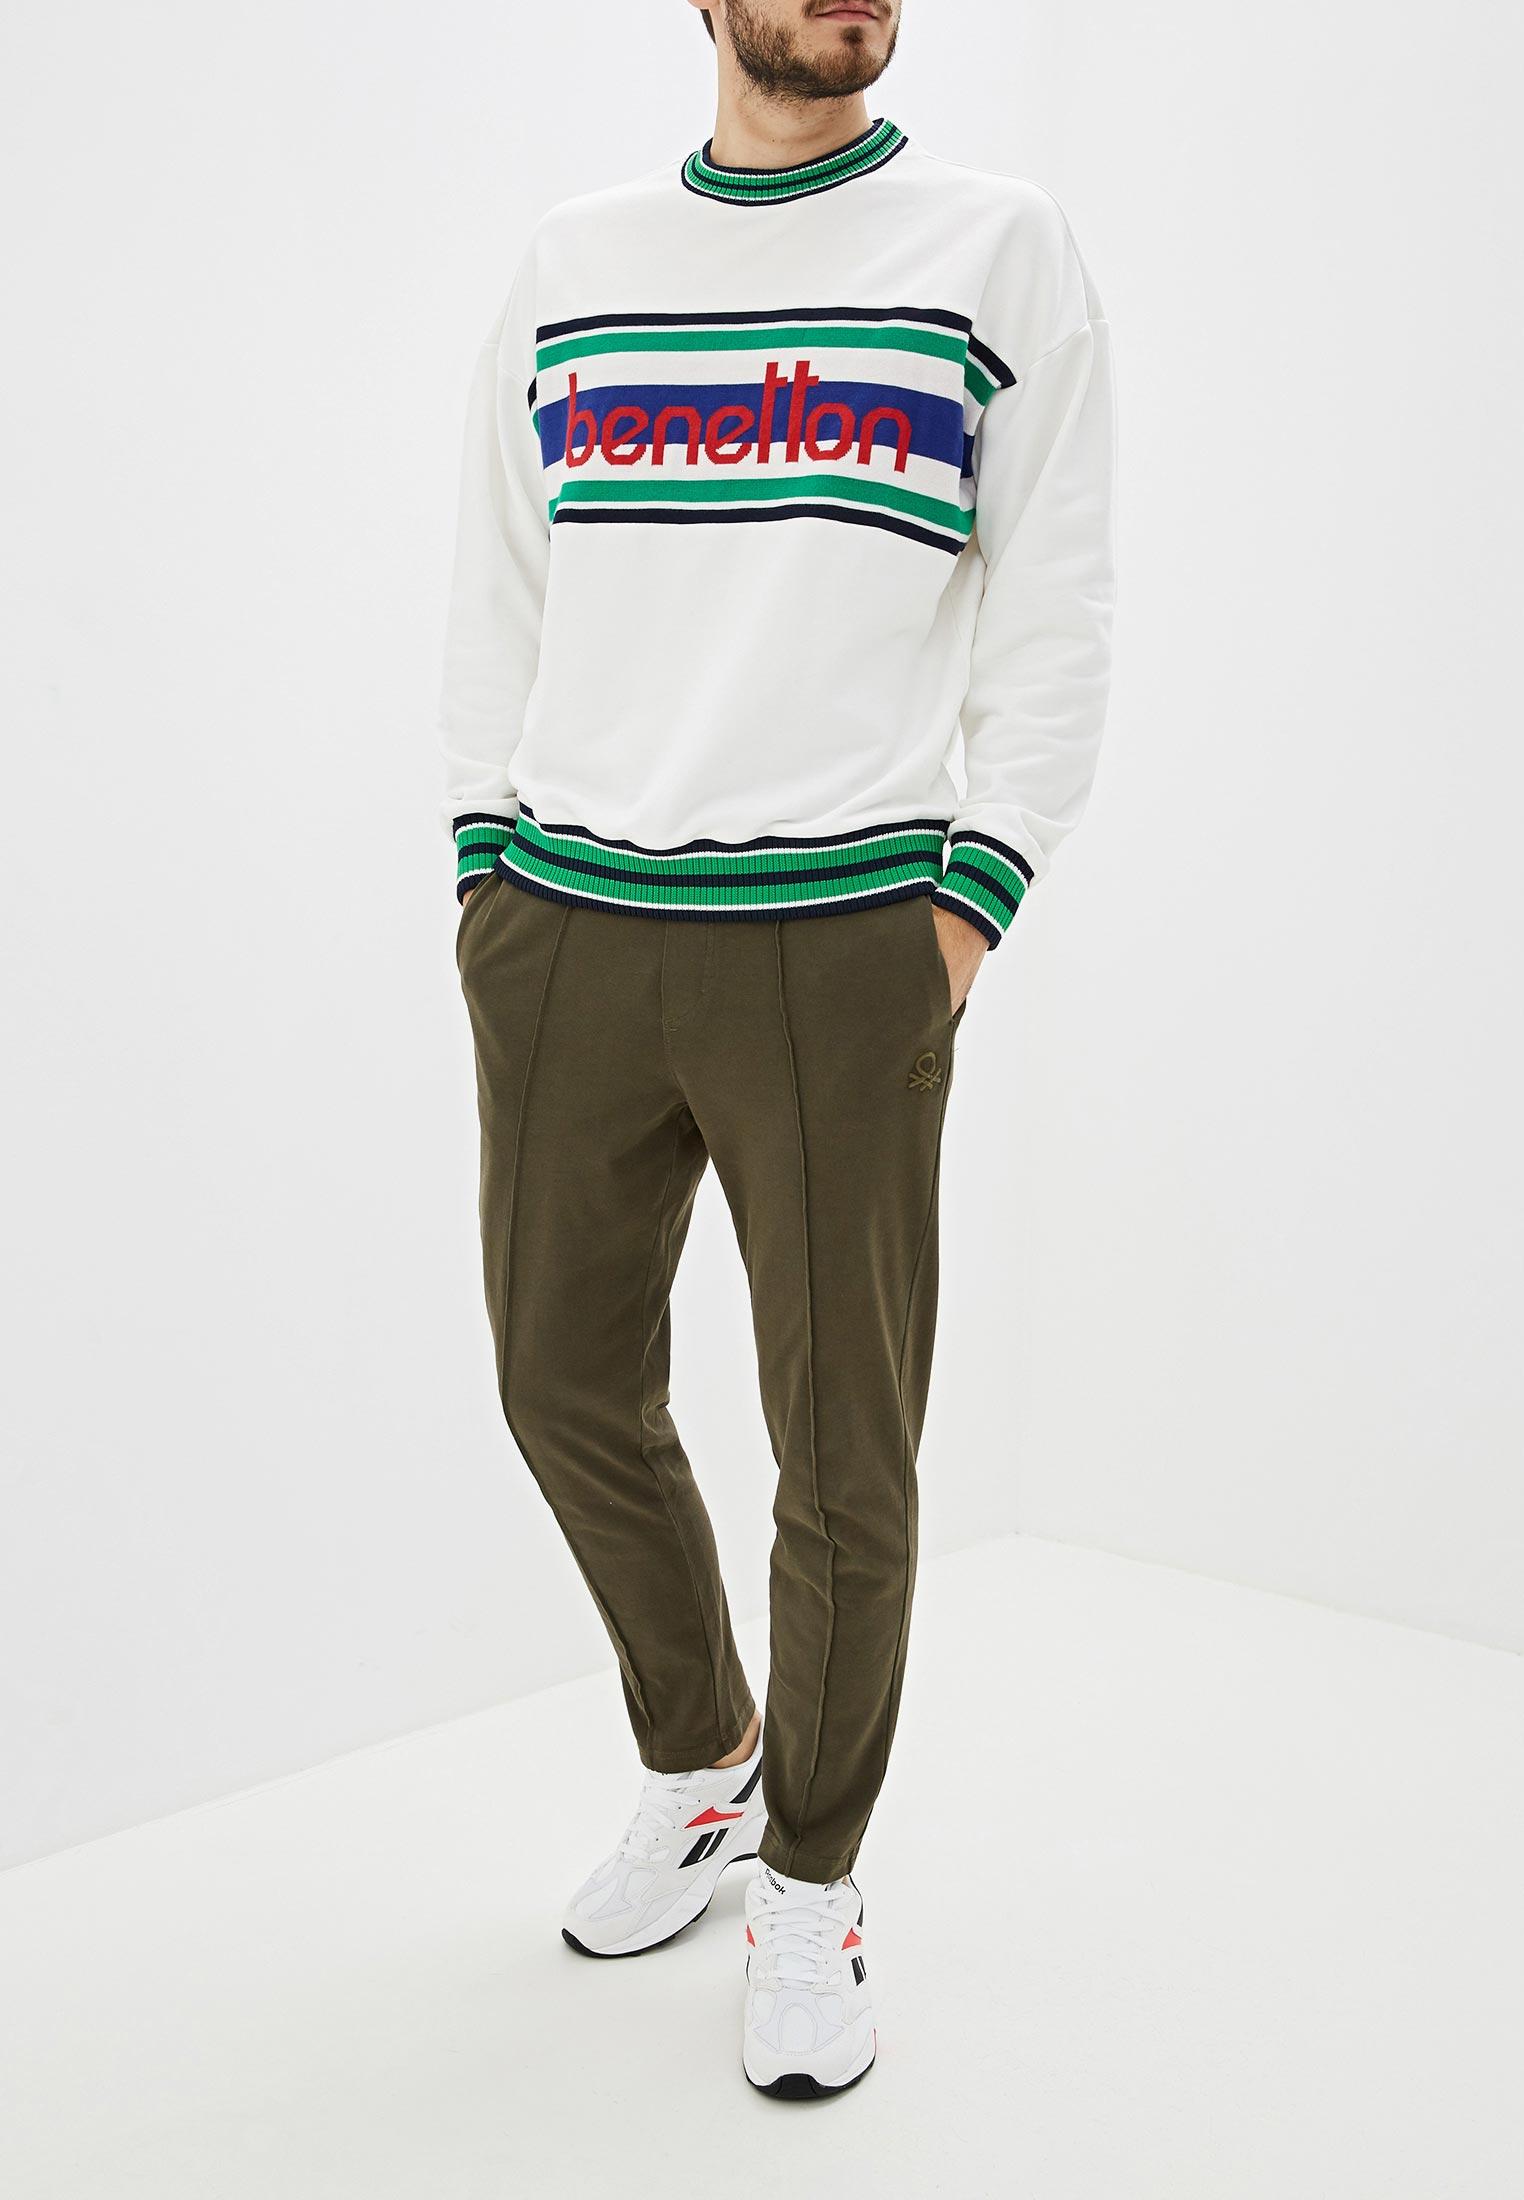 Мужские спортивные брюки United Colors of Benetton (Юнайтед Колорс оф Бенеттон) 3DQWP0436: изображение 2